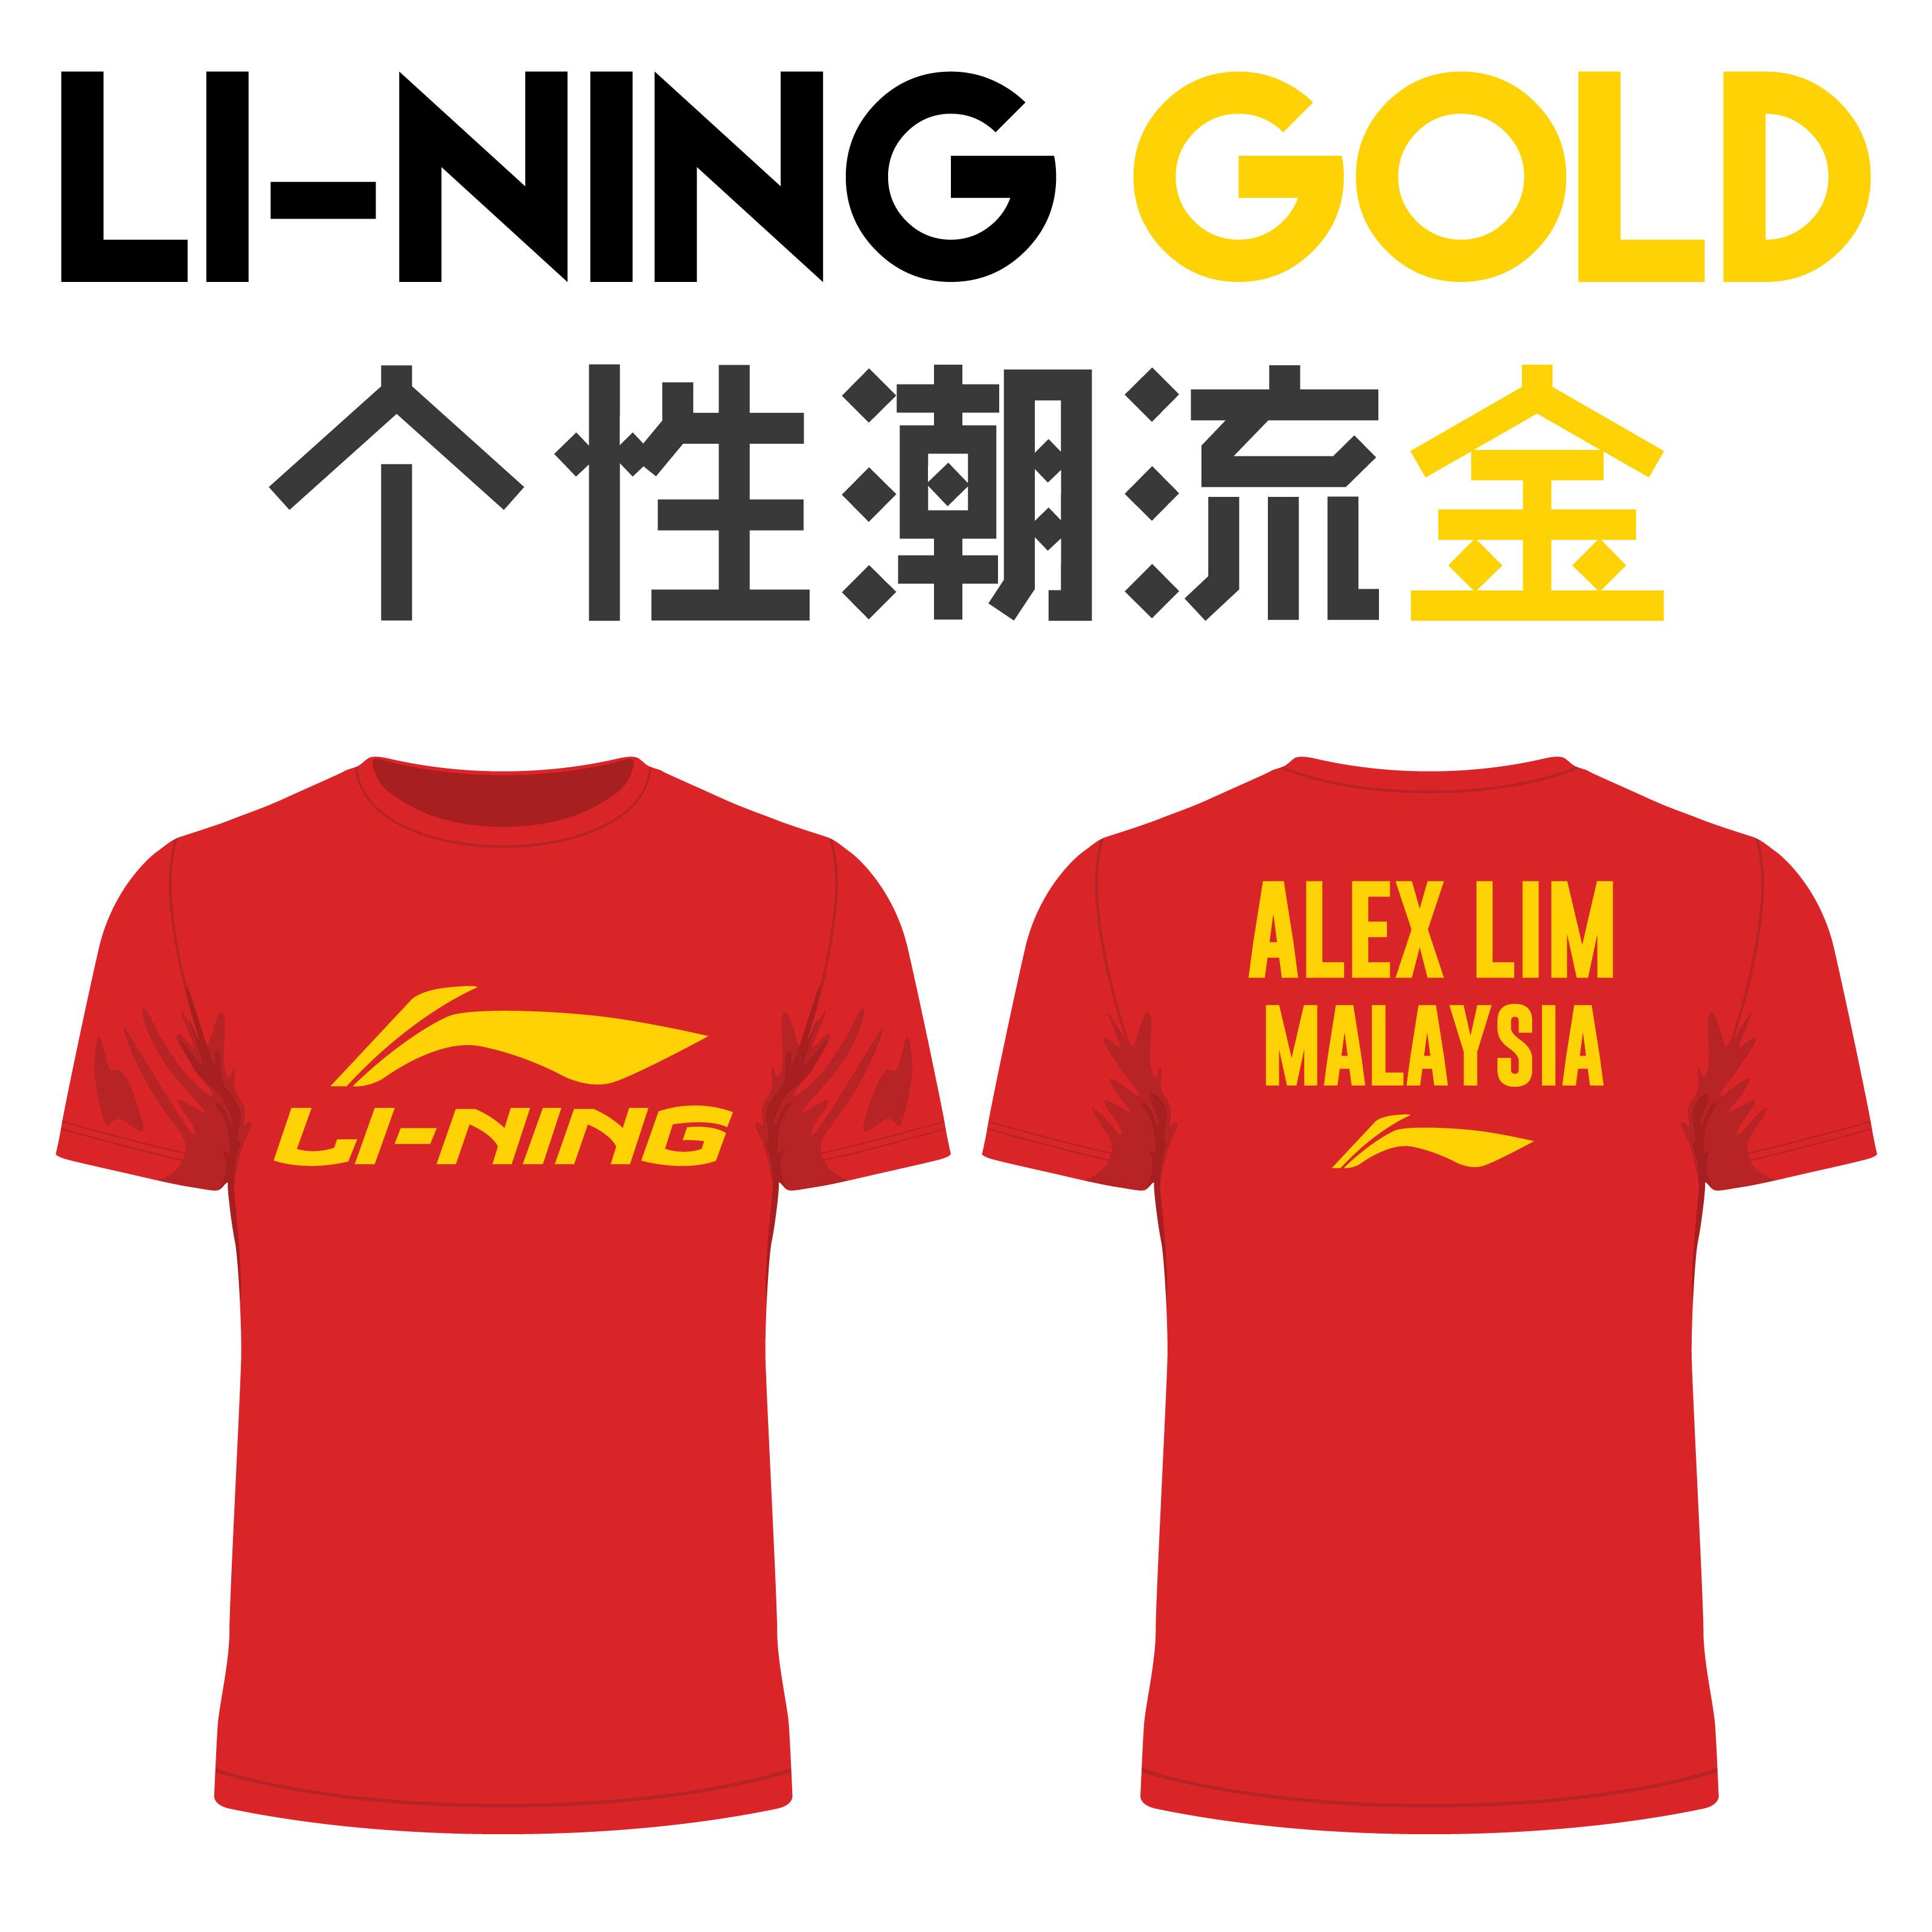 Li-Ning Shirt - Li-Ning Gold